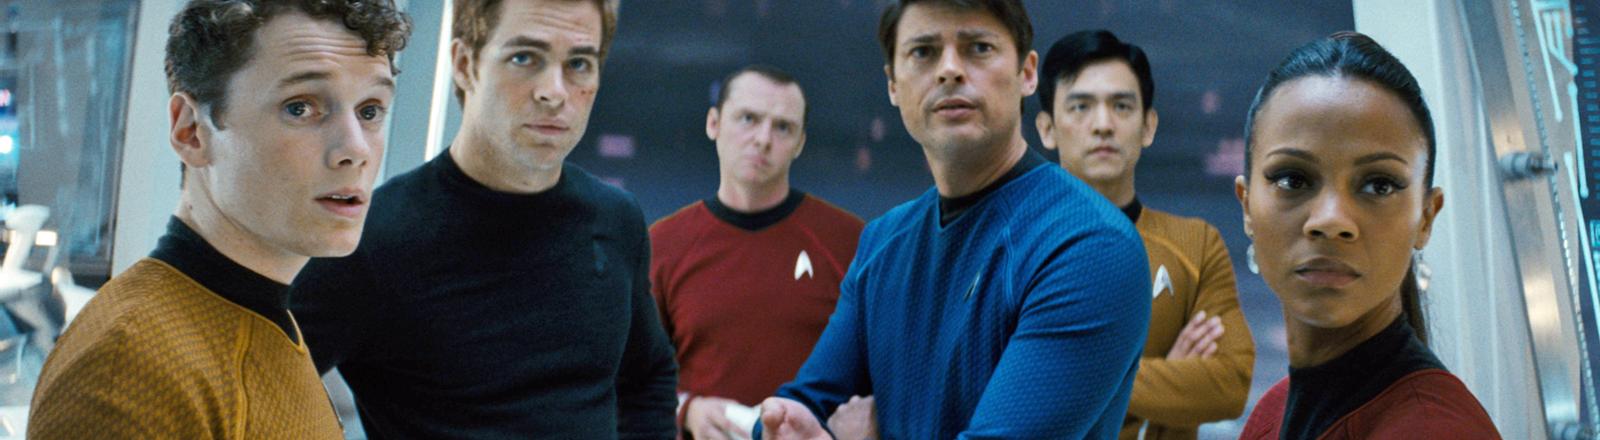 Star Trek: Die Crew der Enterprise um Captain James Kirk.